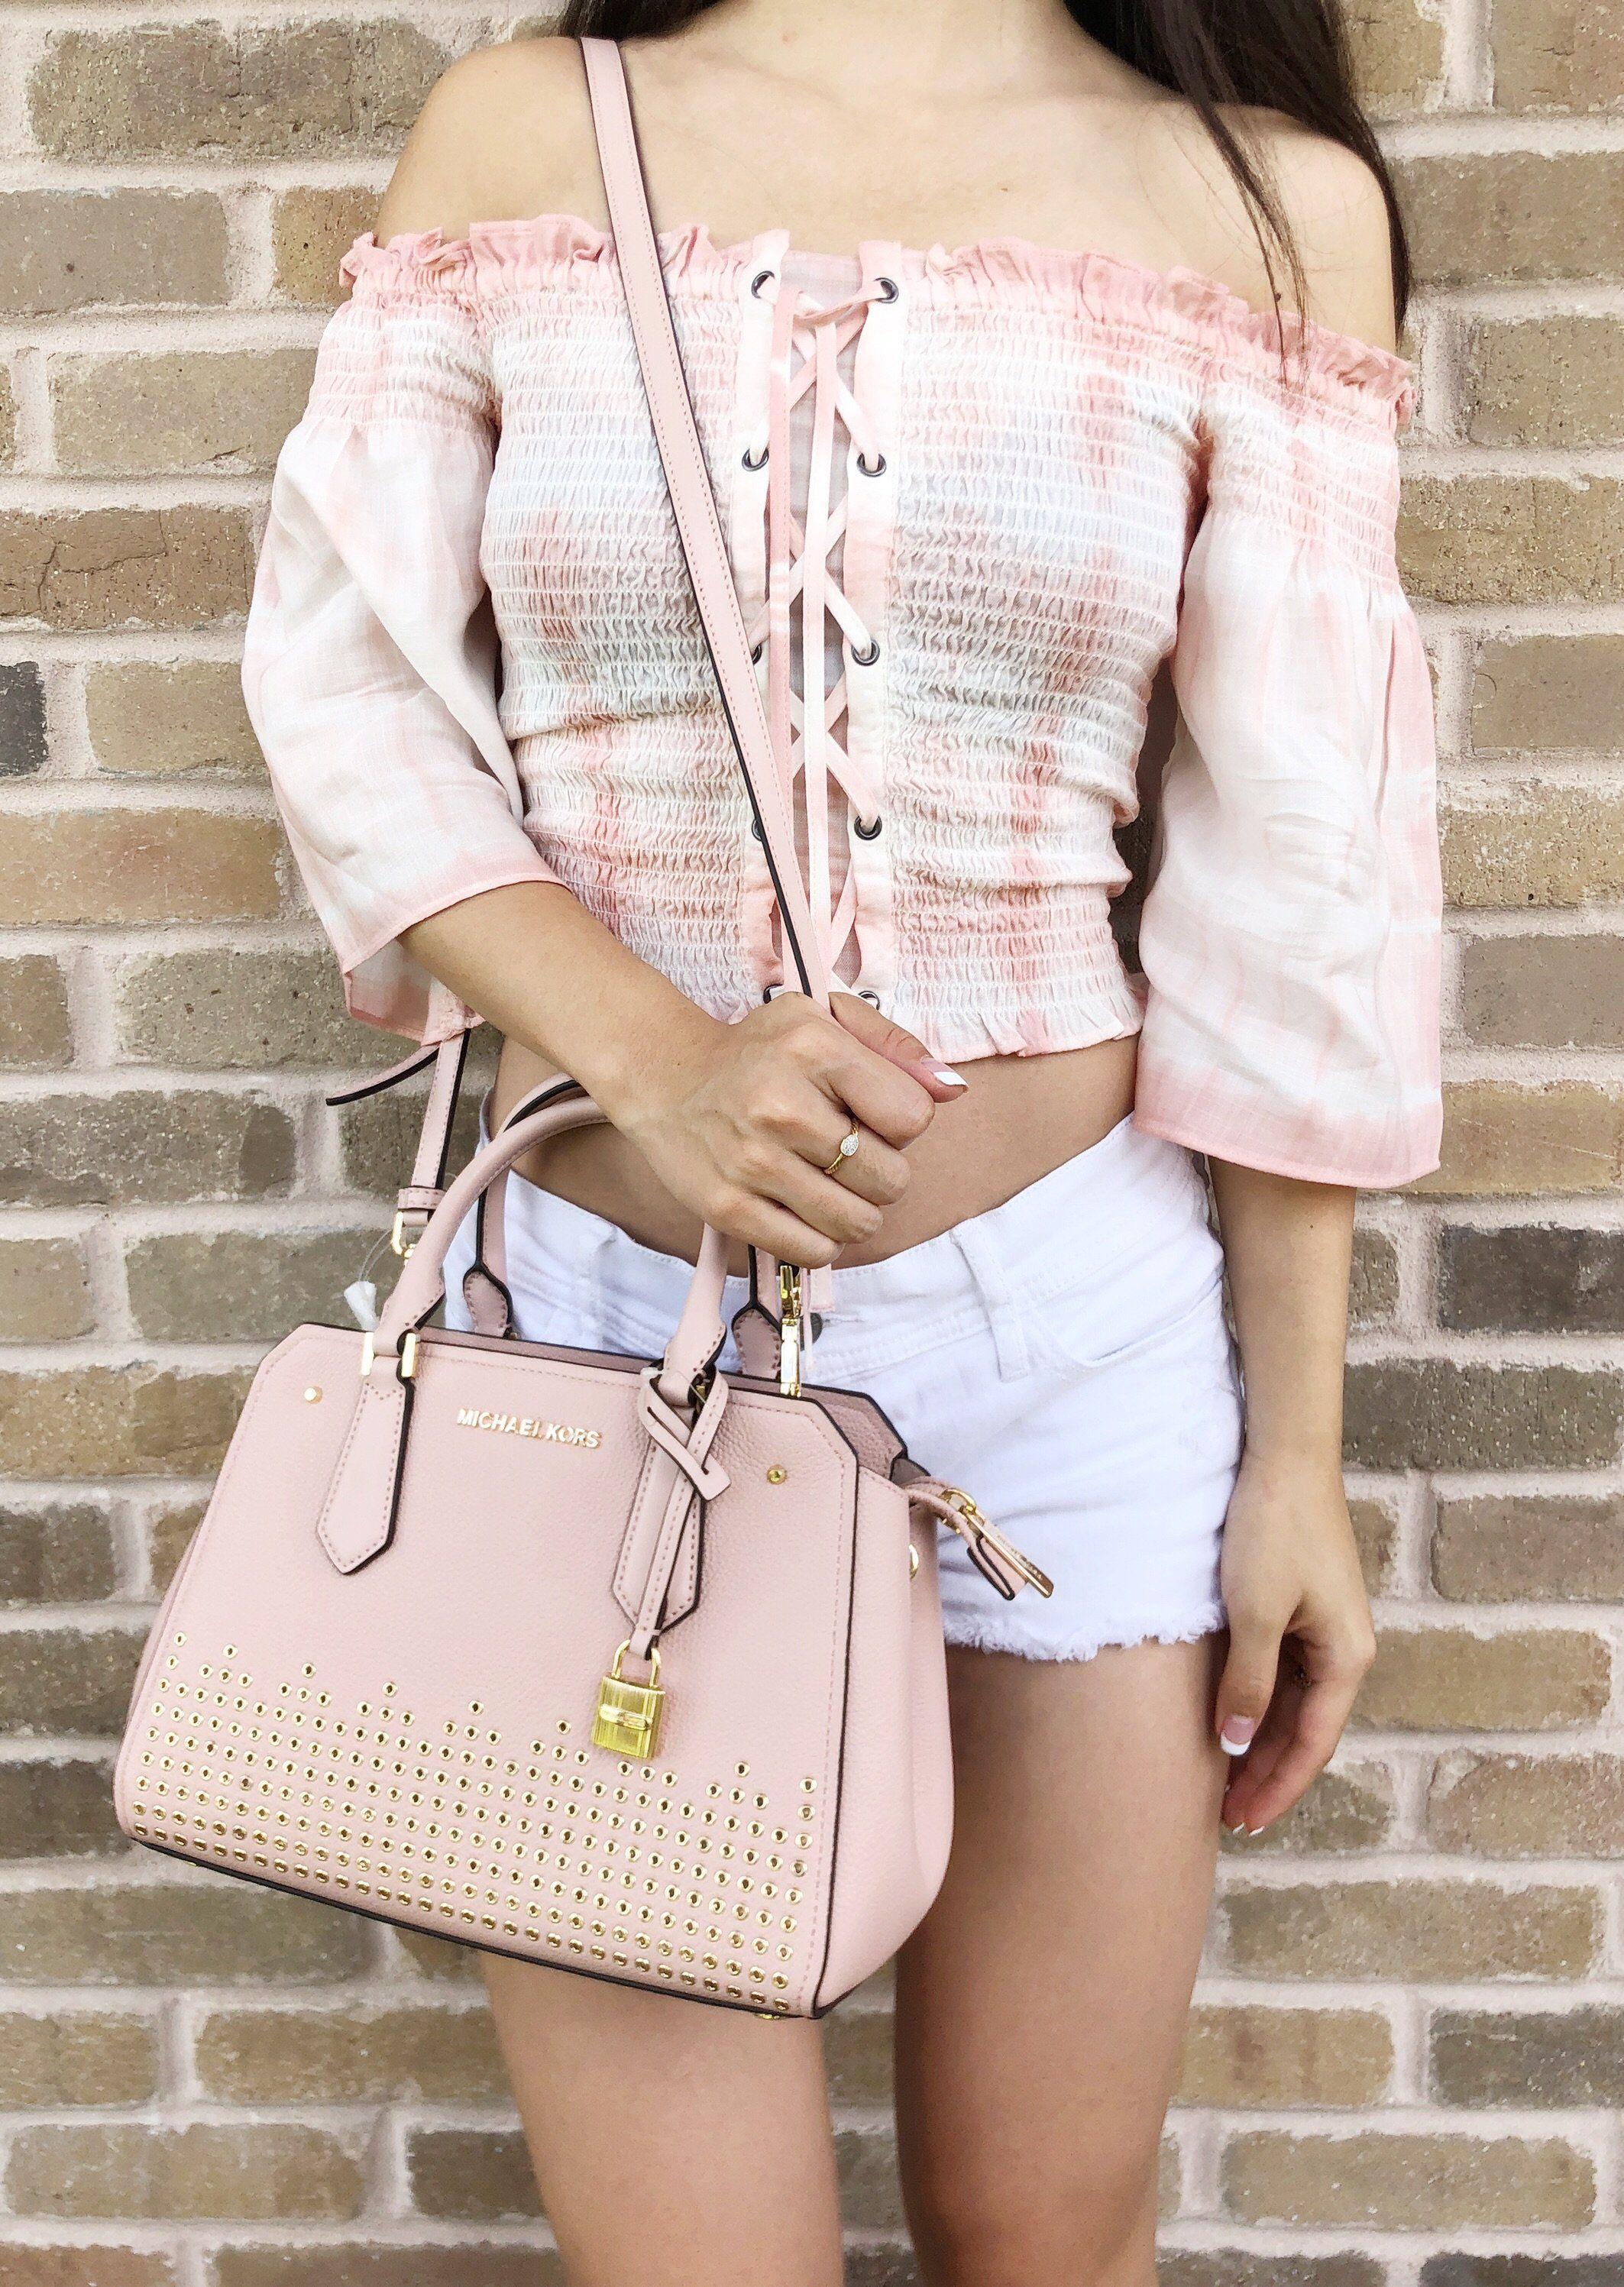 877e3470c1538 Michael Kors Hayes Medium Messenger Pastel Pink  MK  Handbags  MichaelKors